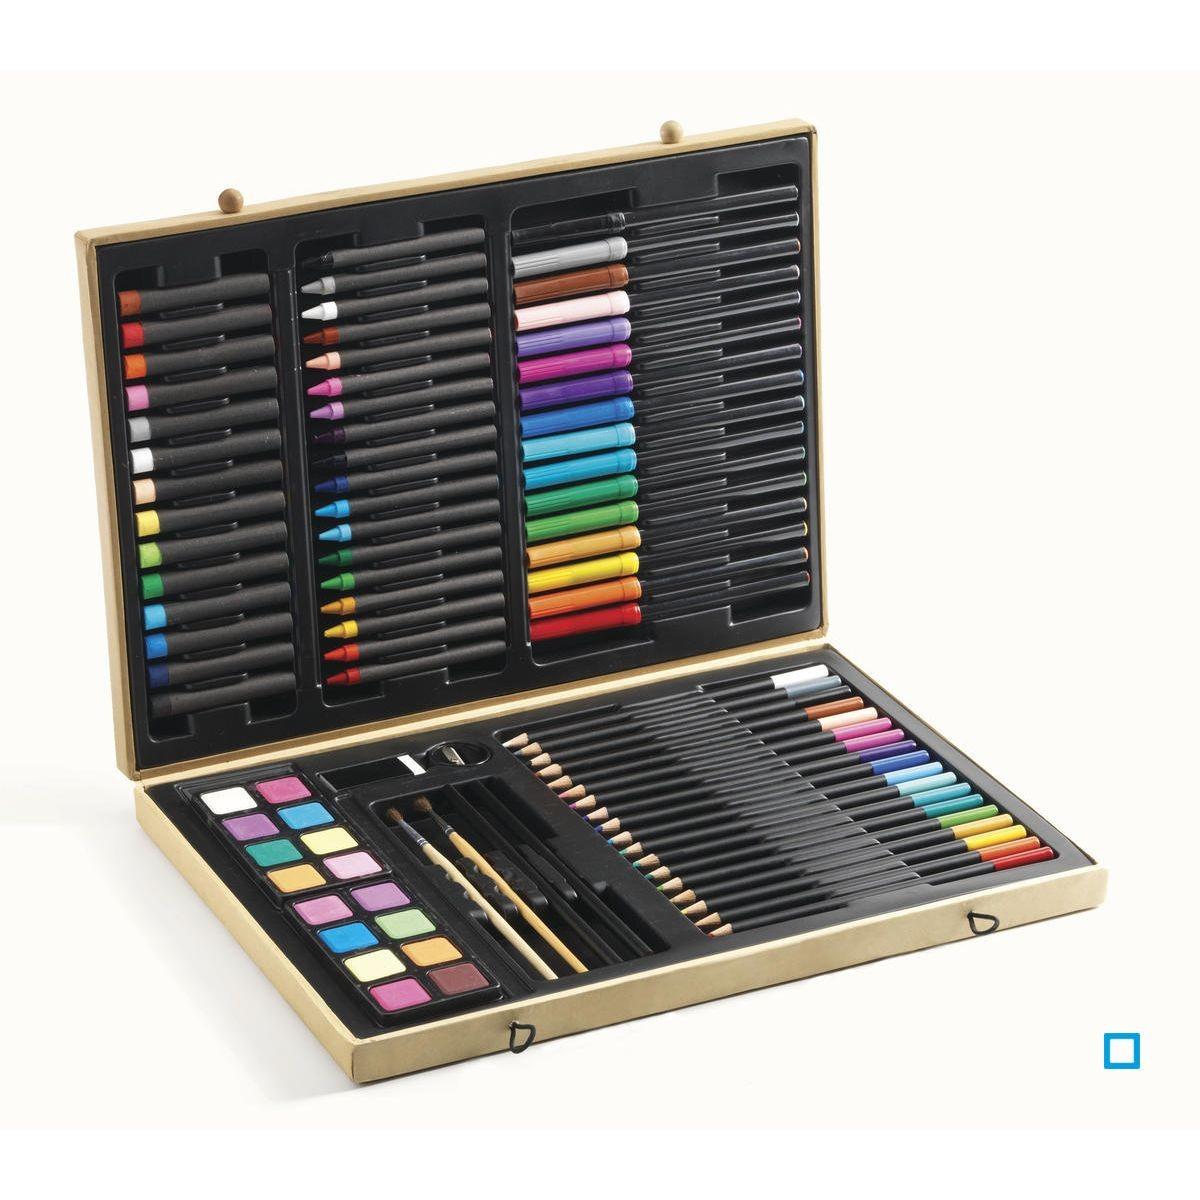 Grande Boite De Couleurs Coffret Dessin Crayons De Cire Coloriage